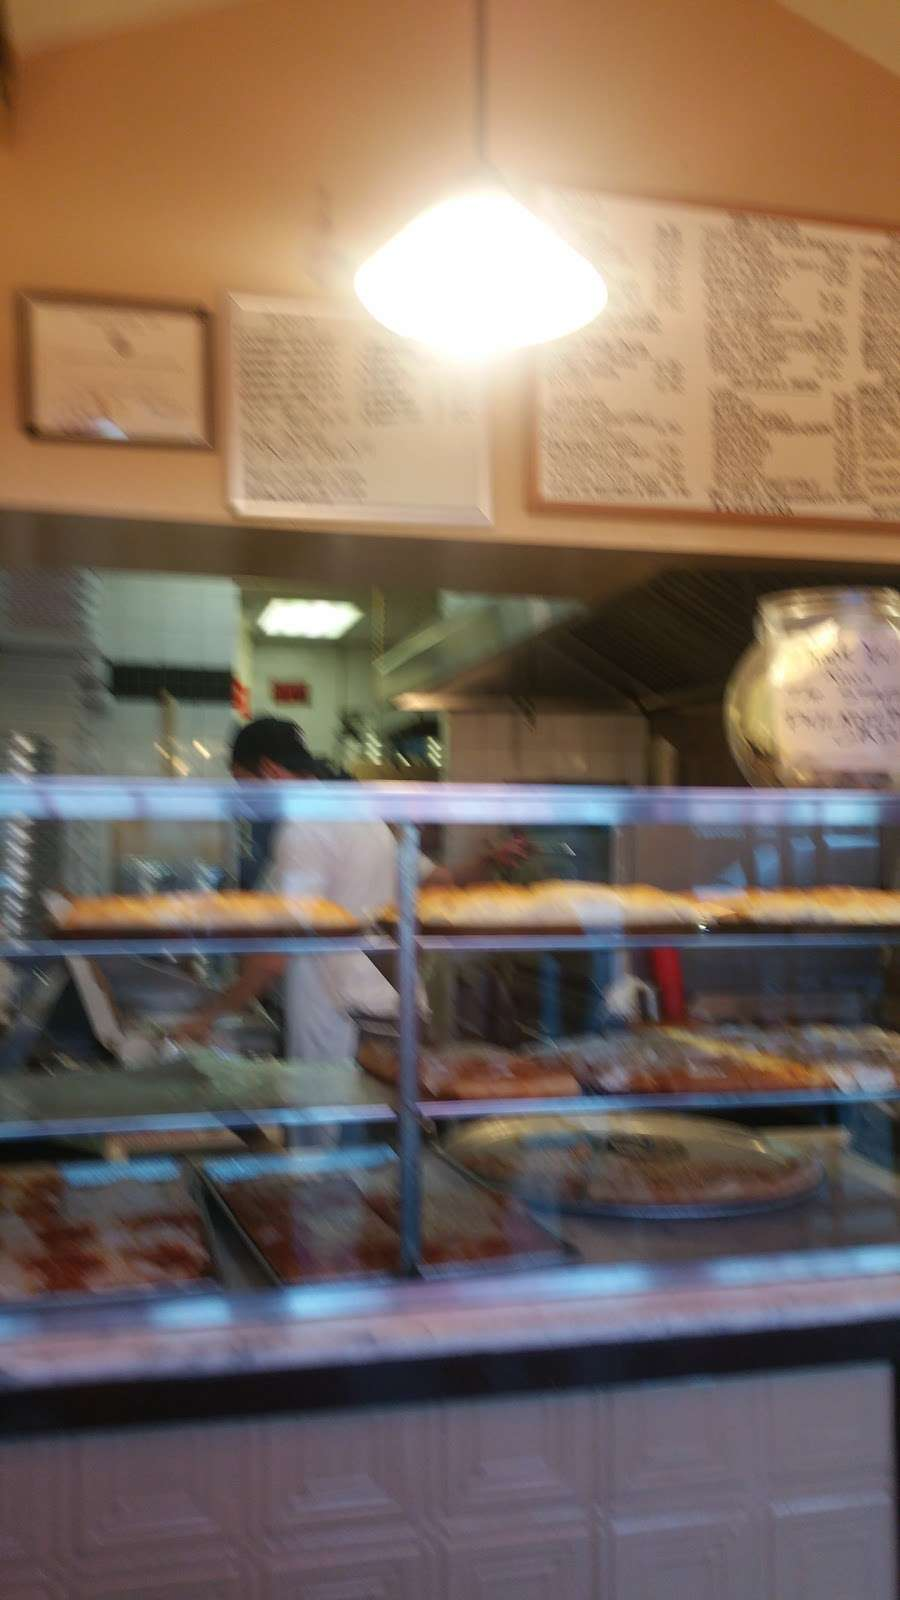 Philadelphia Grille - restaurant  | Photo 2 of 9 | Address: 10004 4th Ave, Brooklyn, NY 11209, USA | Phone: (718) 238-0747